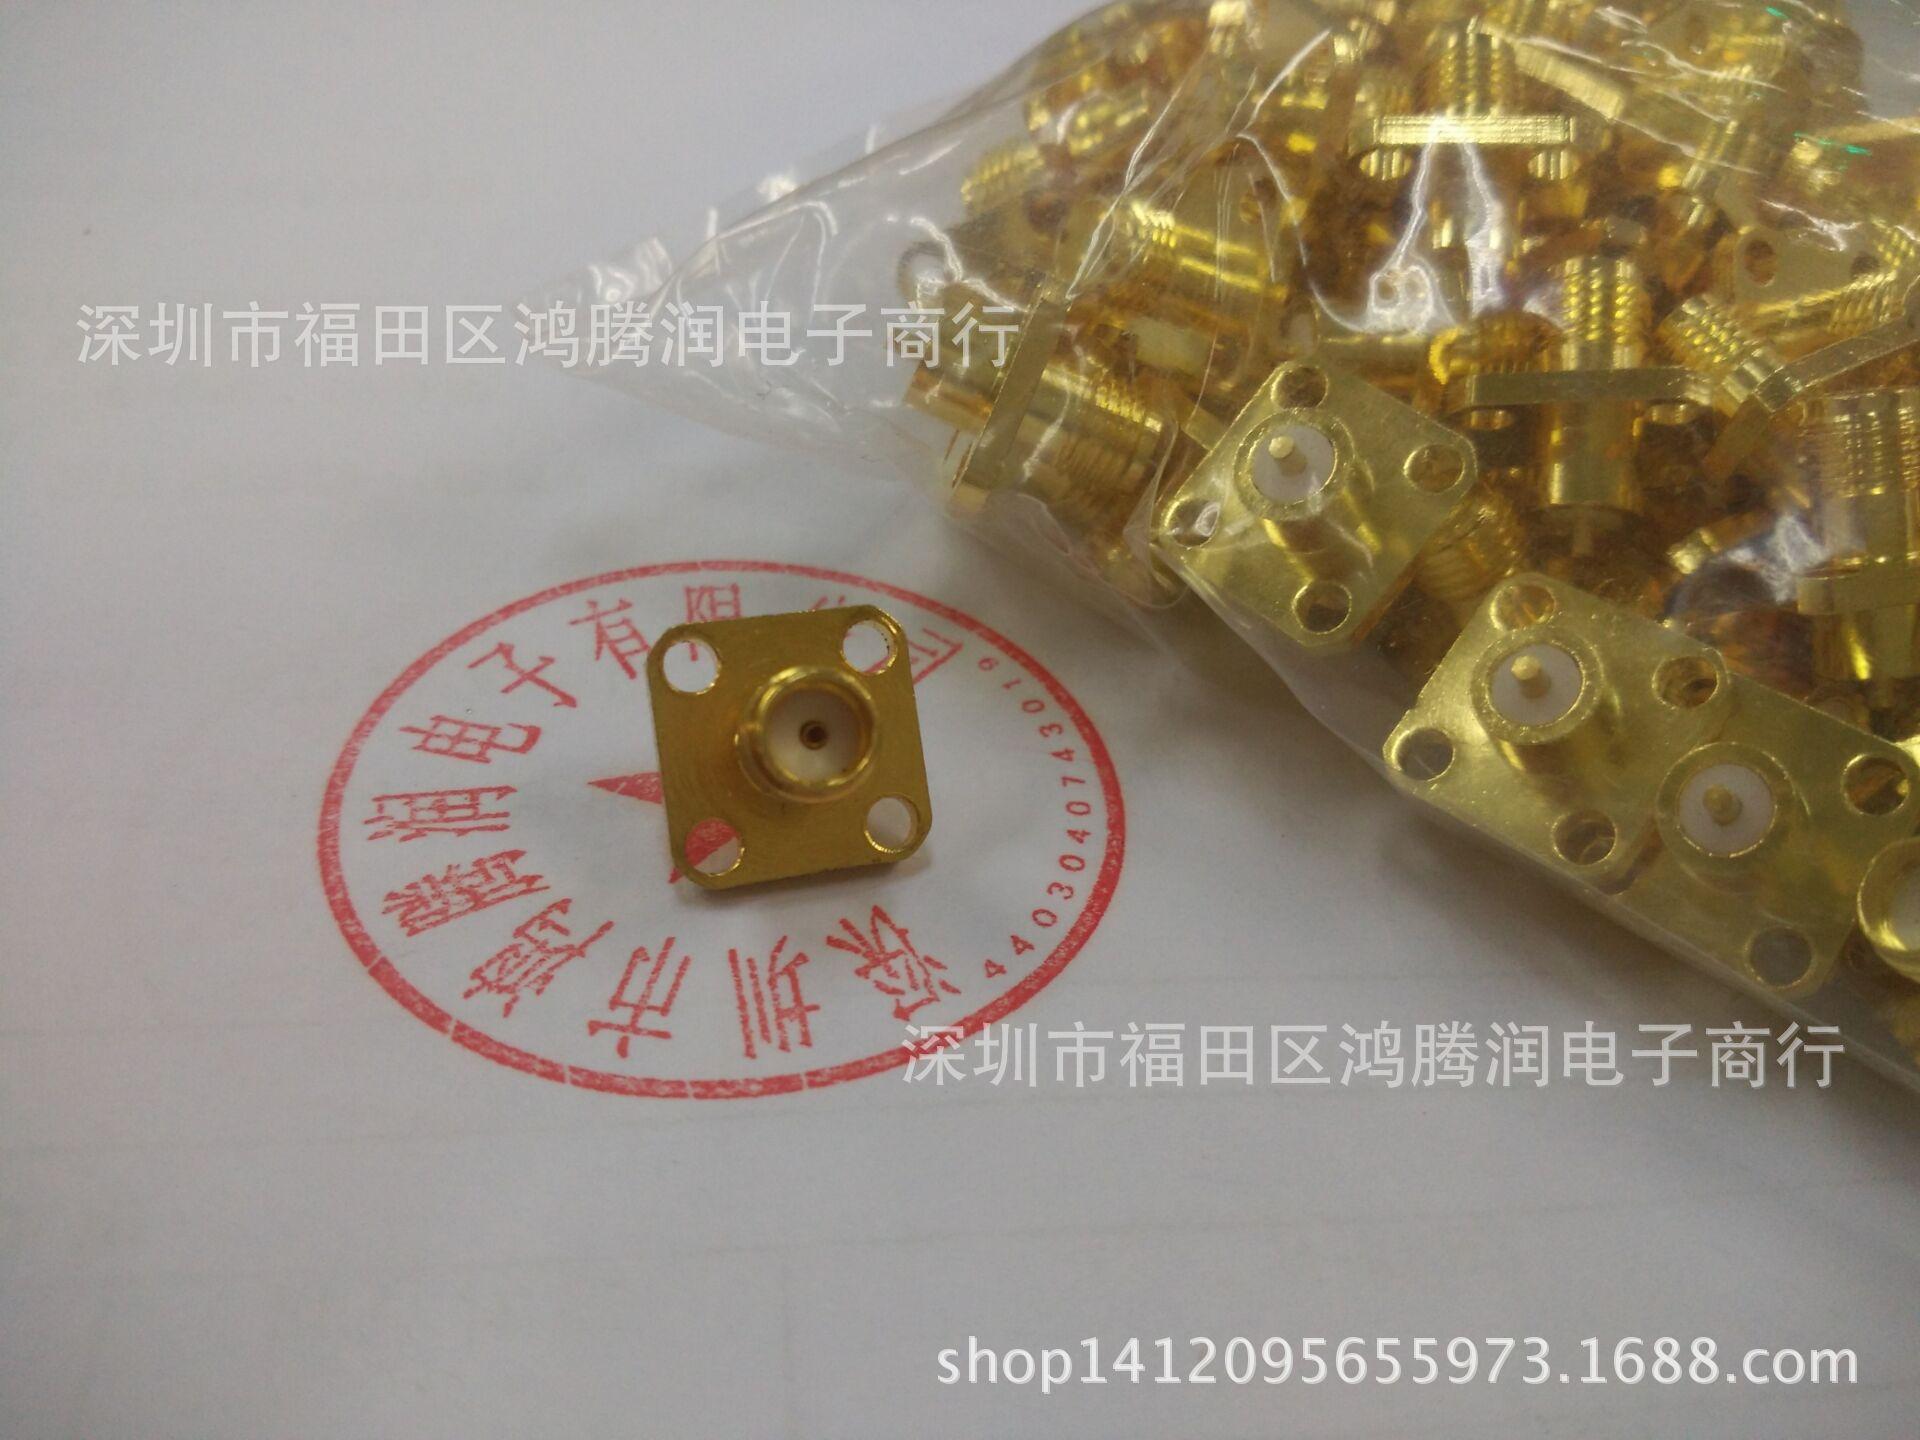 sma-kf方板(接线口包铜)工厂直销